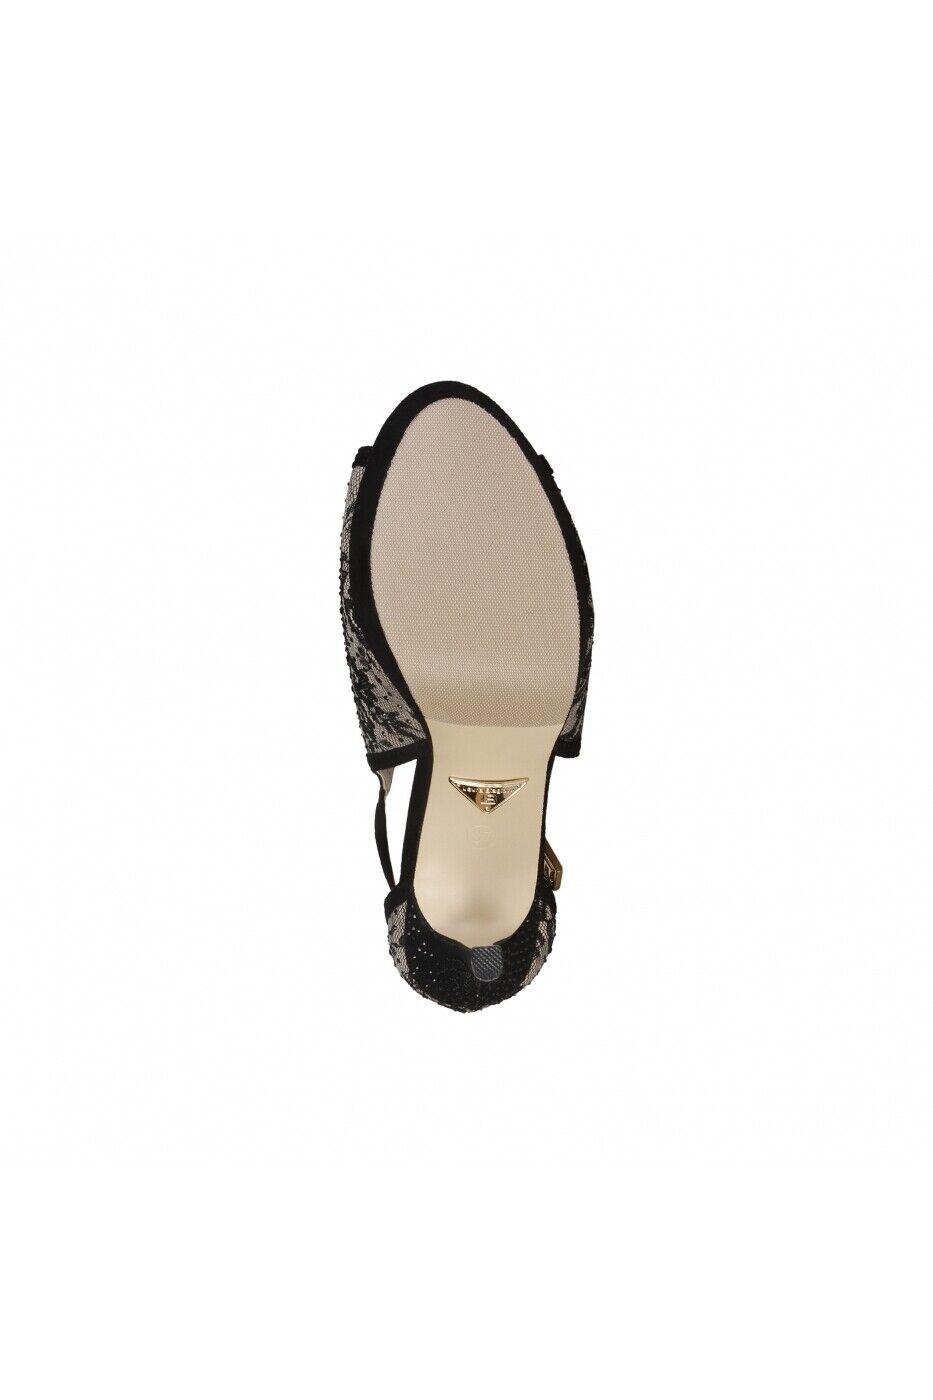 CLEARANCE SALE Laura Biagiotti Biagiotti Biagiotti Style 421 – Cloth   Taupe Colour Heels 37f980